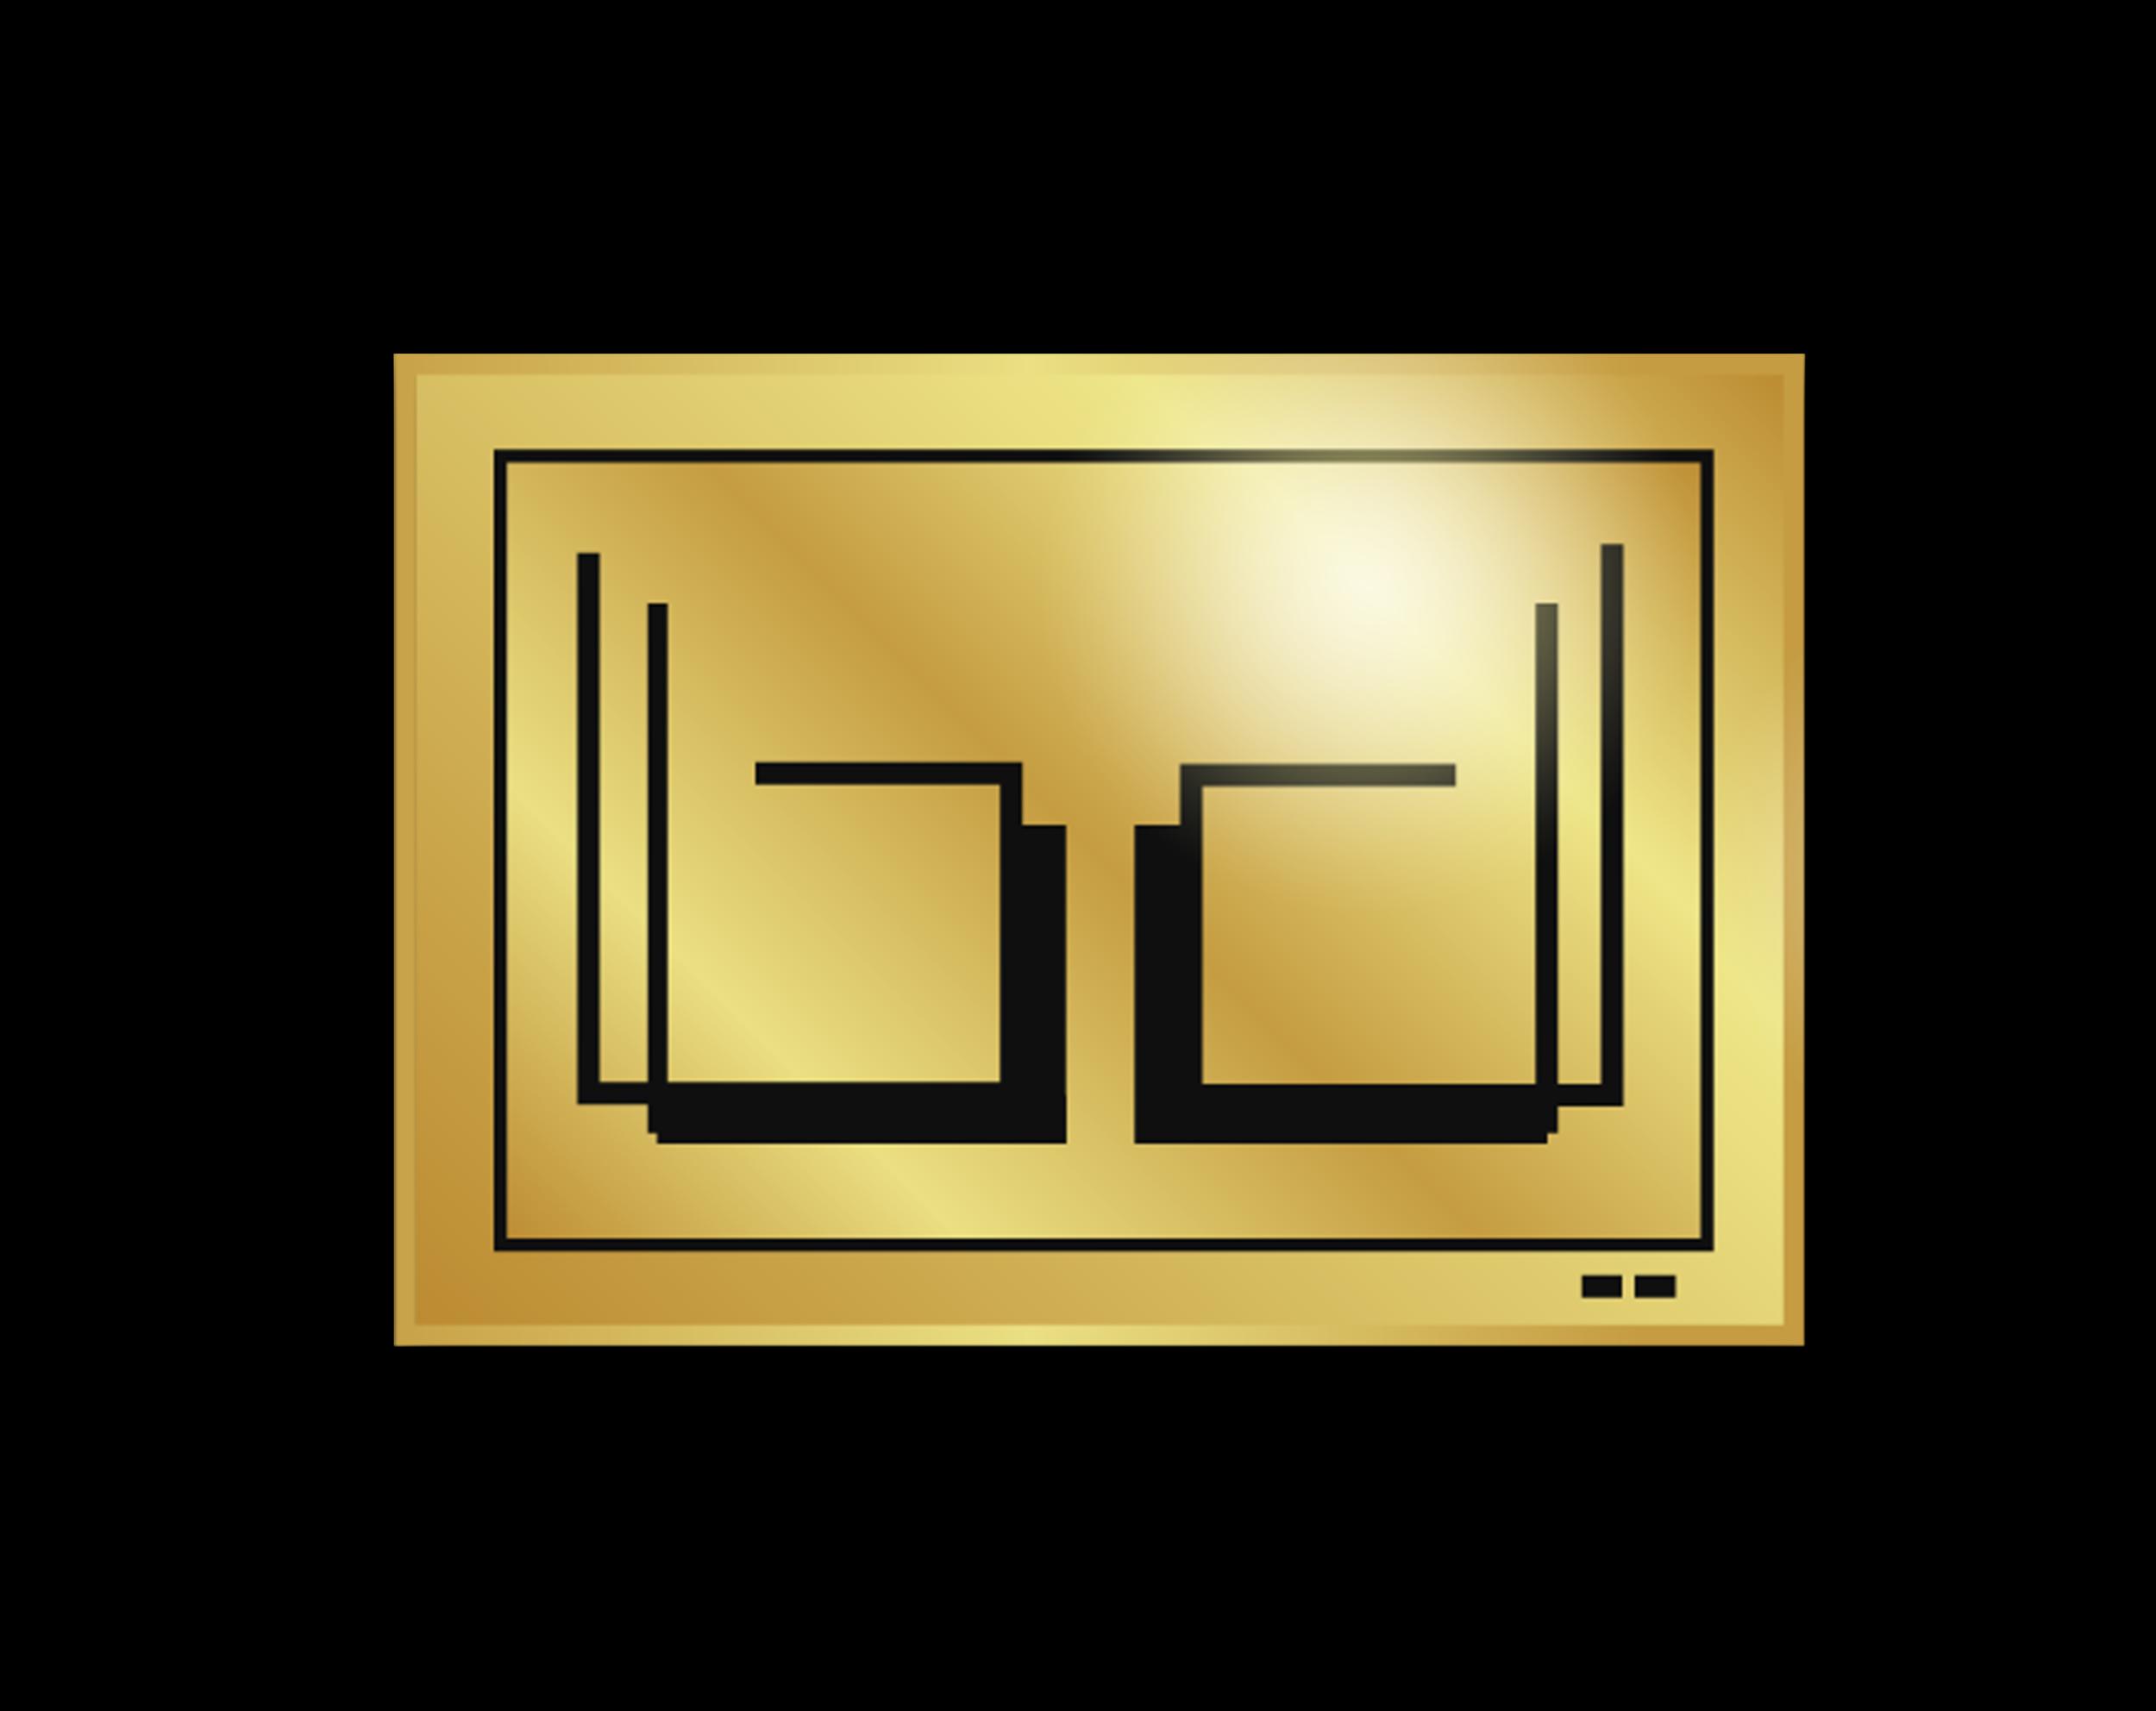 BLEEJ_HI-RES_GOLD_BLACK_ICON.png